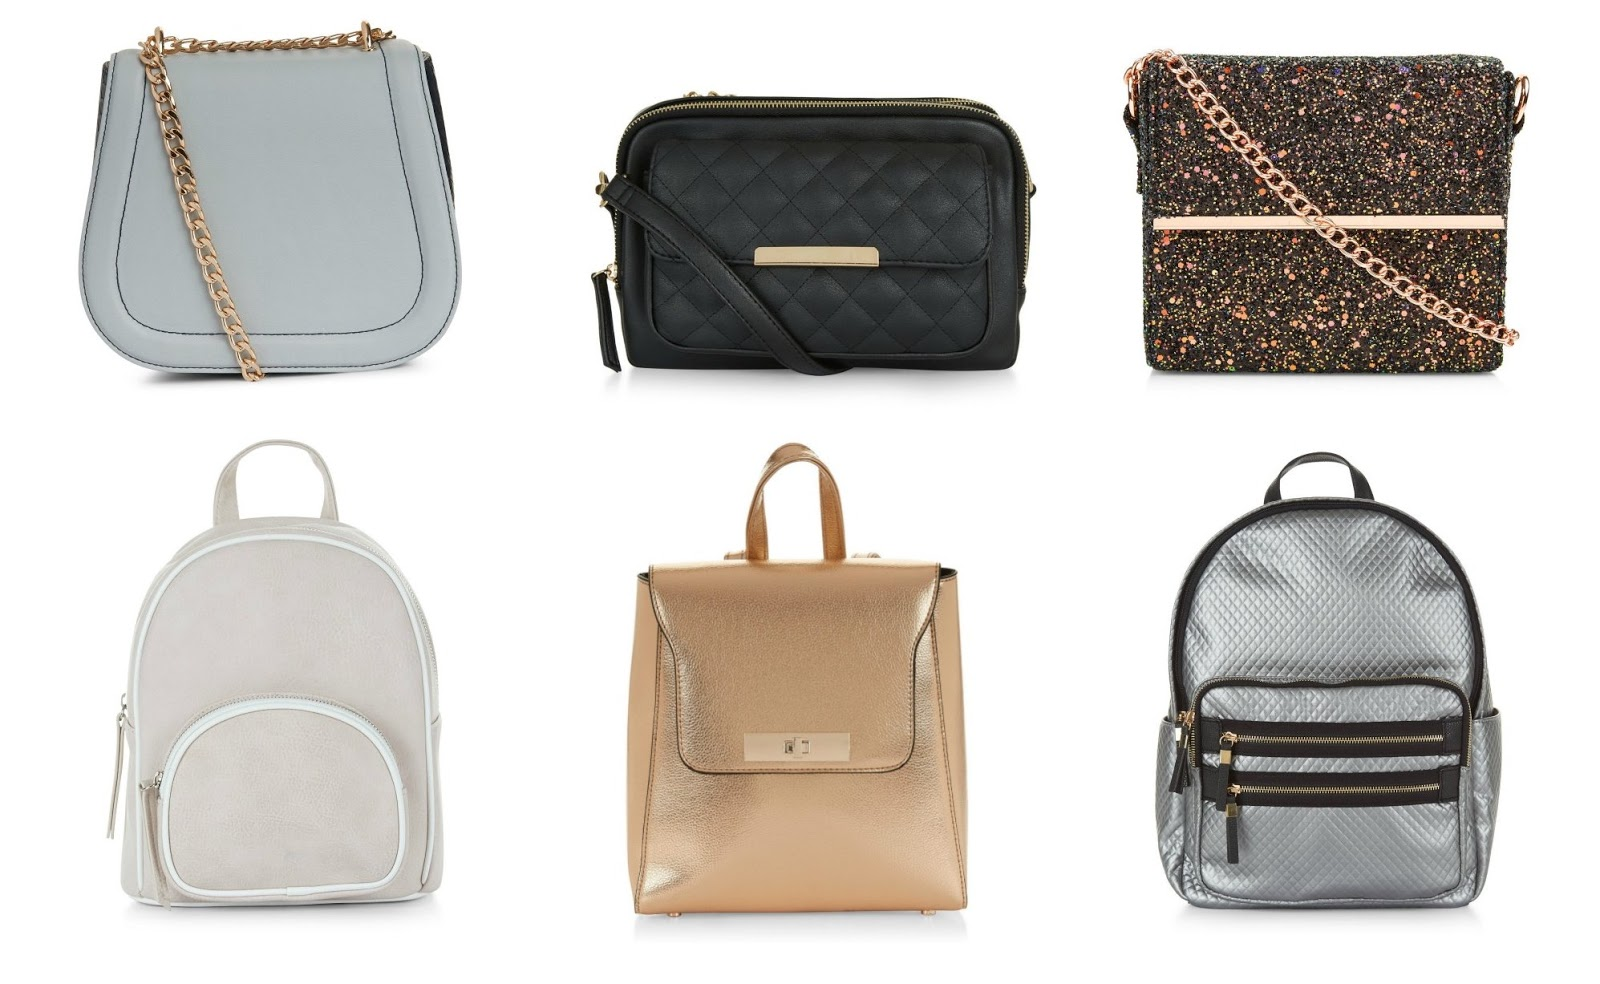 New Look Handbags 2017